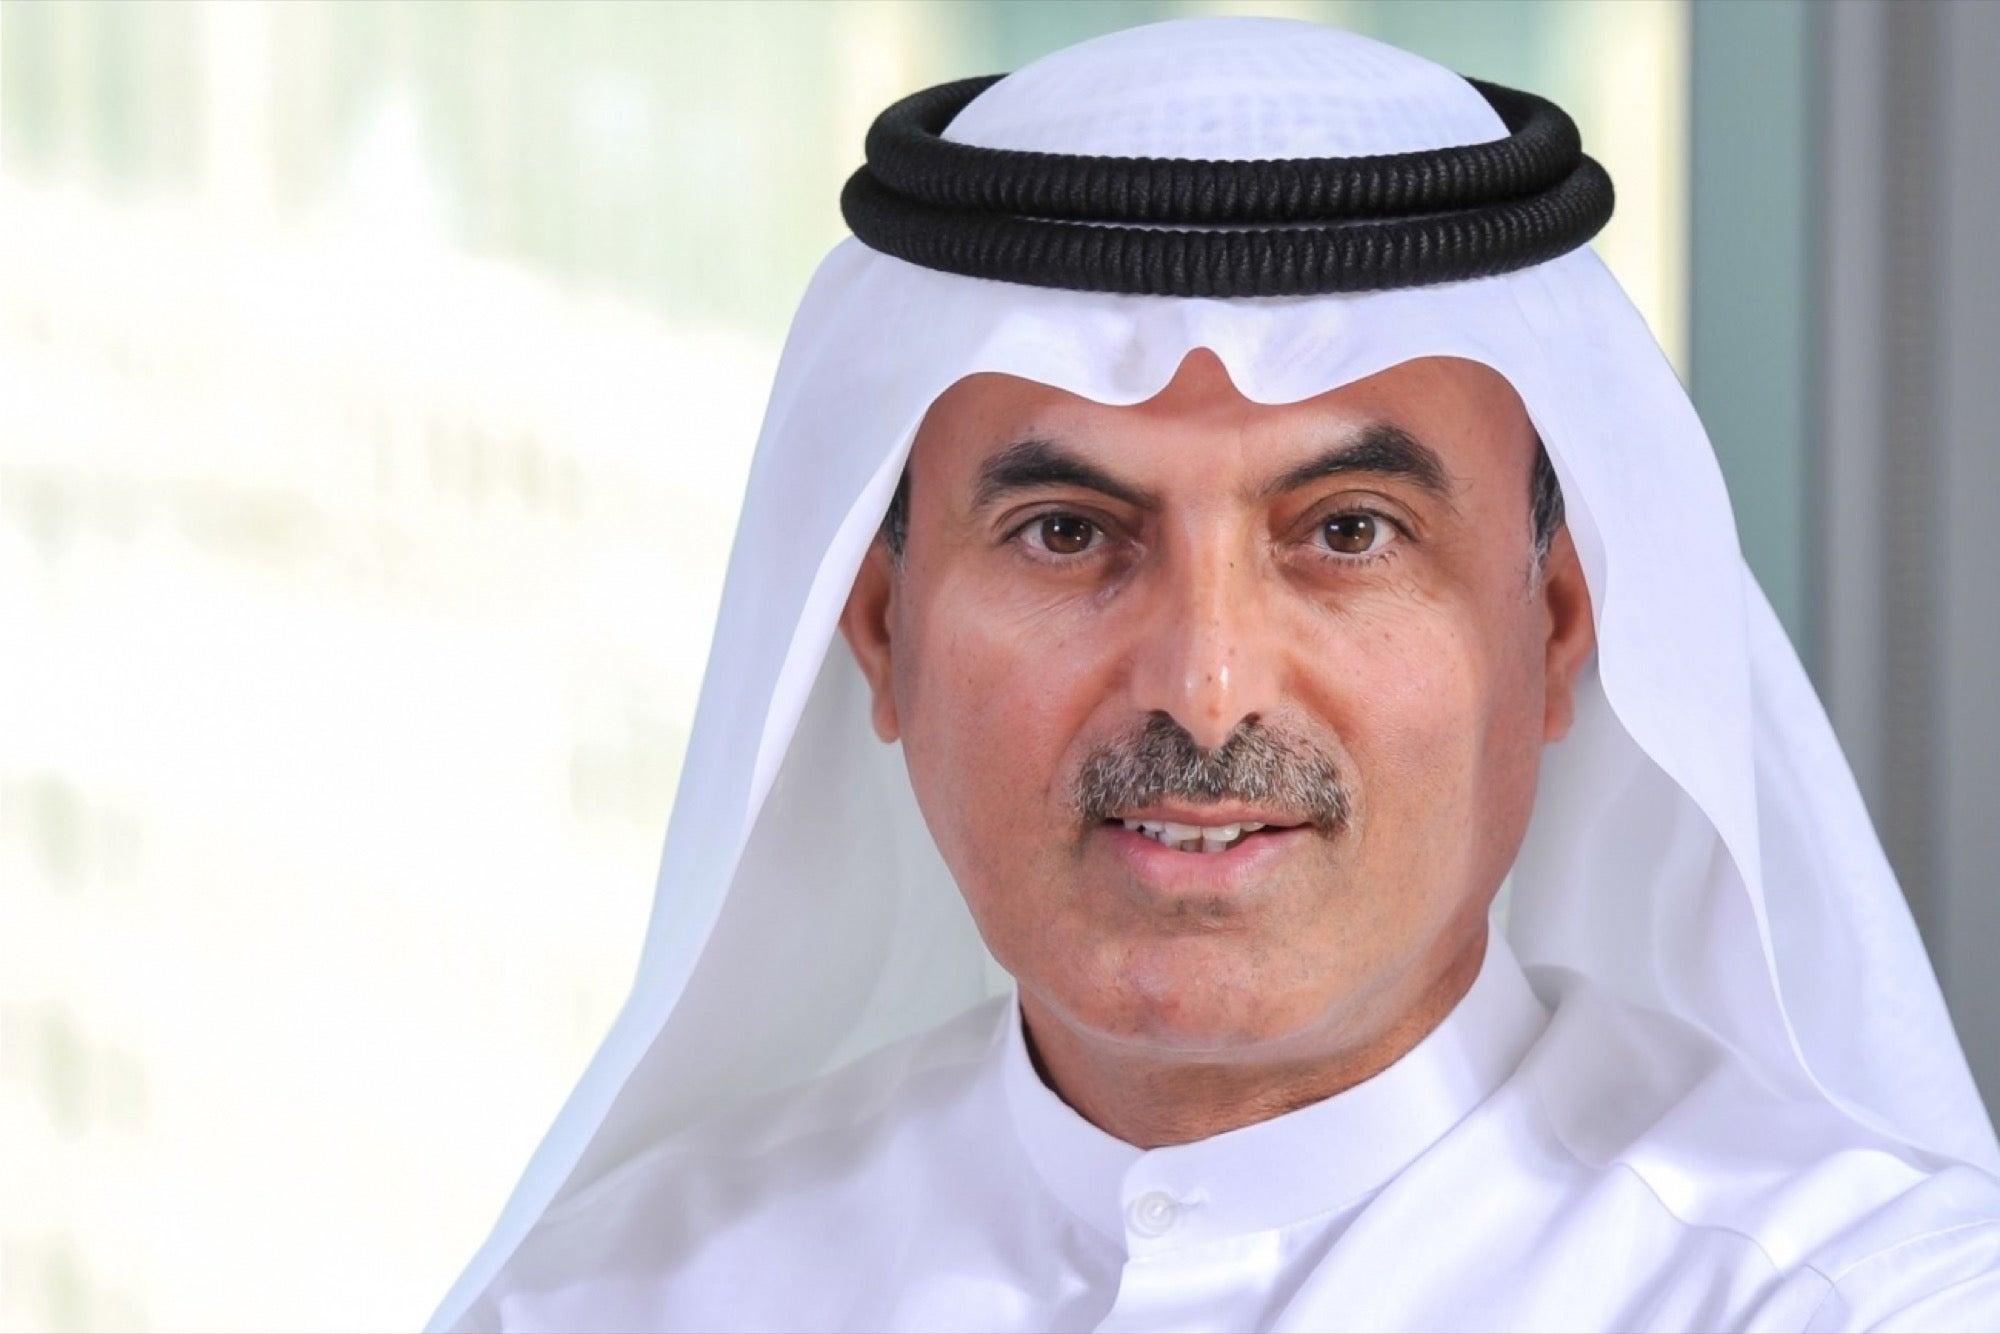 Ahmad Abdulal